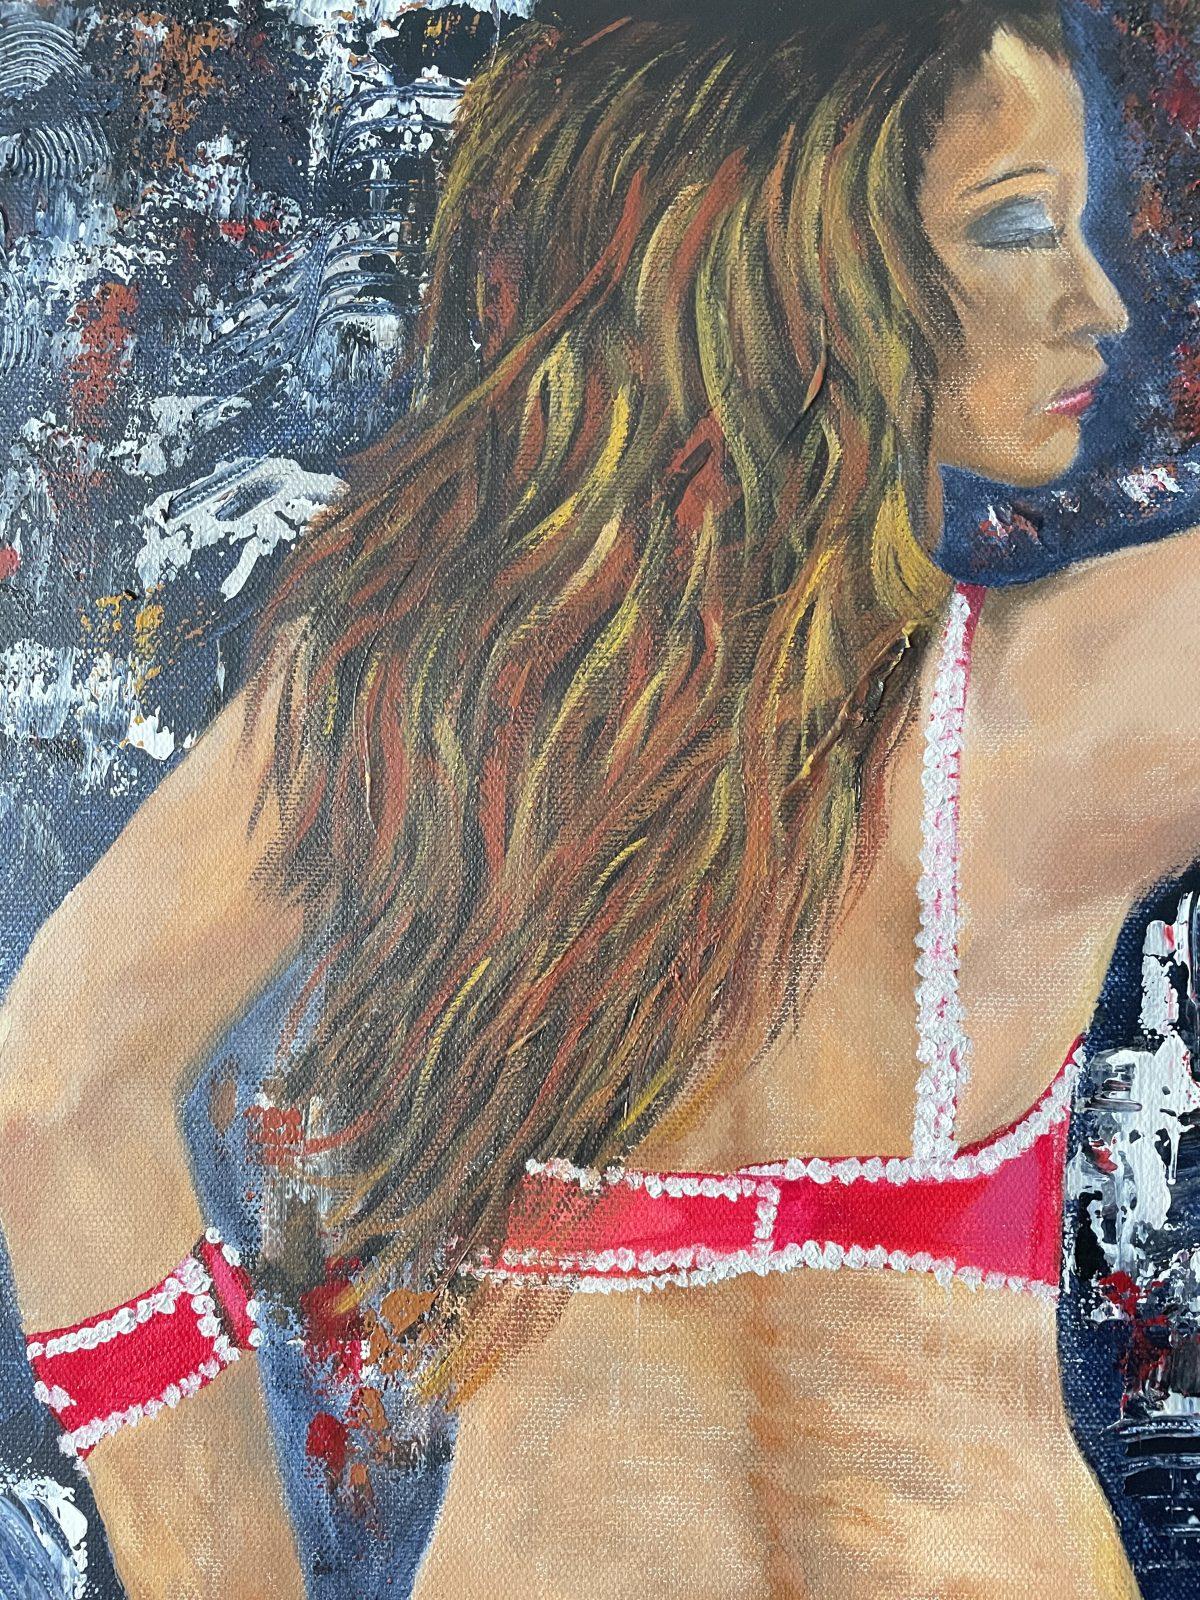 Danseuse du Harem, de l'artiste Katarzyna Boduch